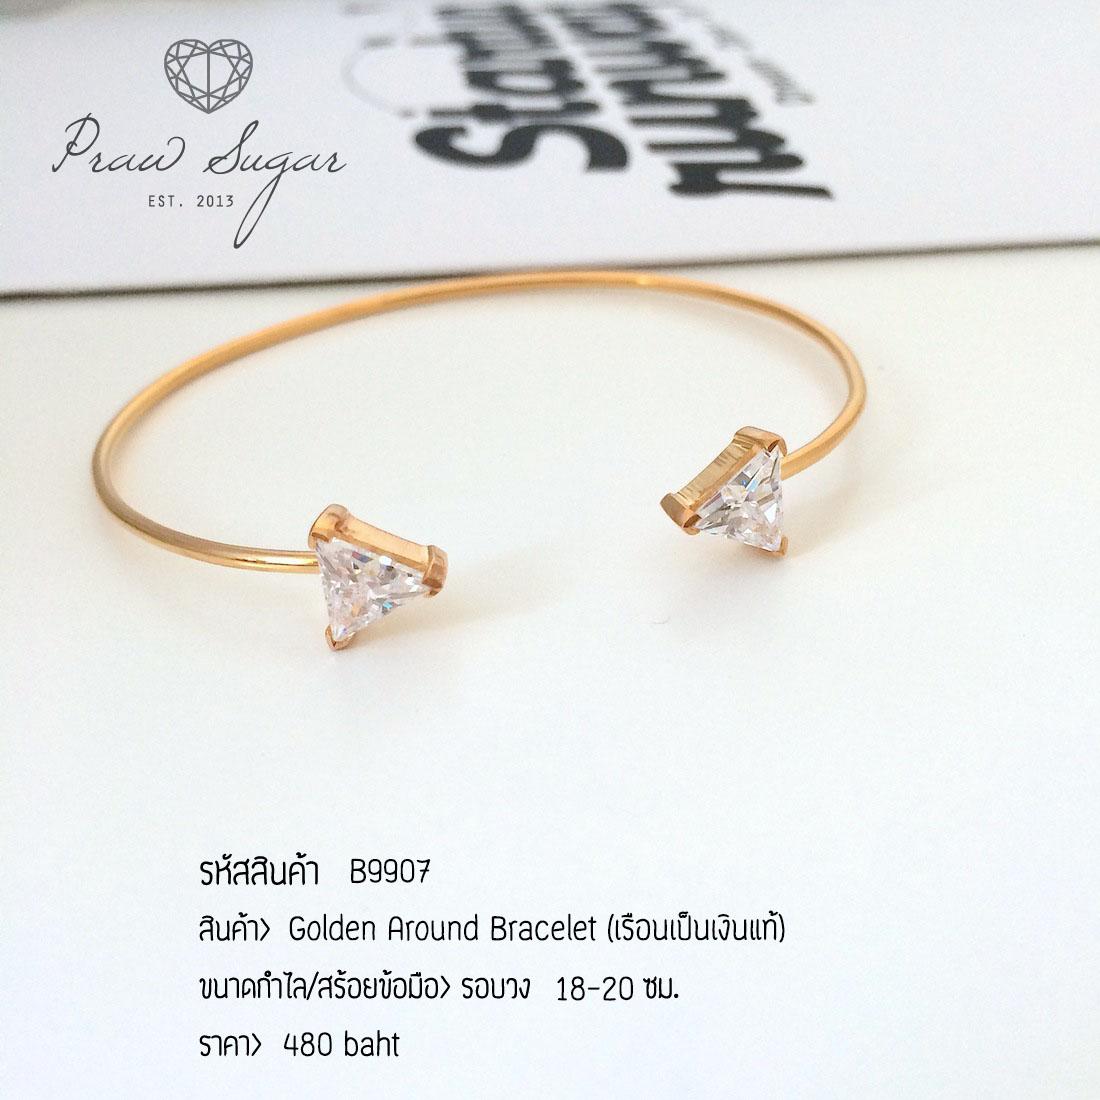 Golden Around Bracelet (เรือนเป็นเงินแท้)